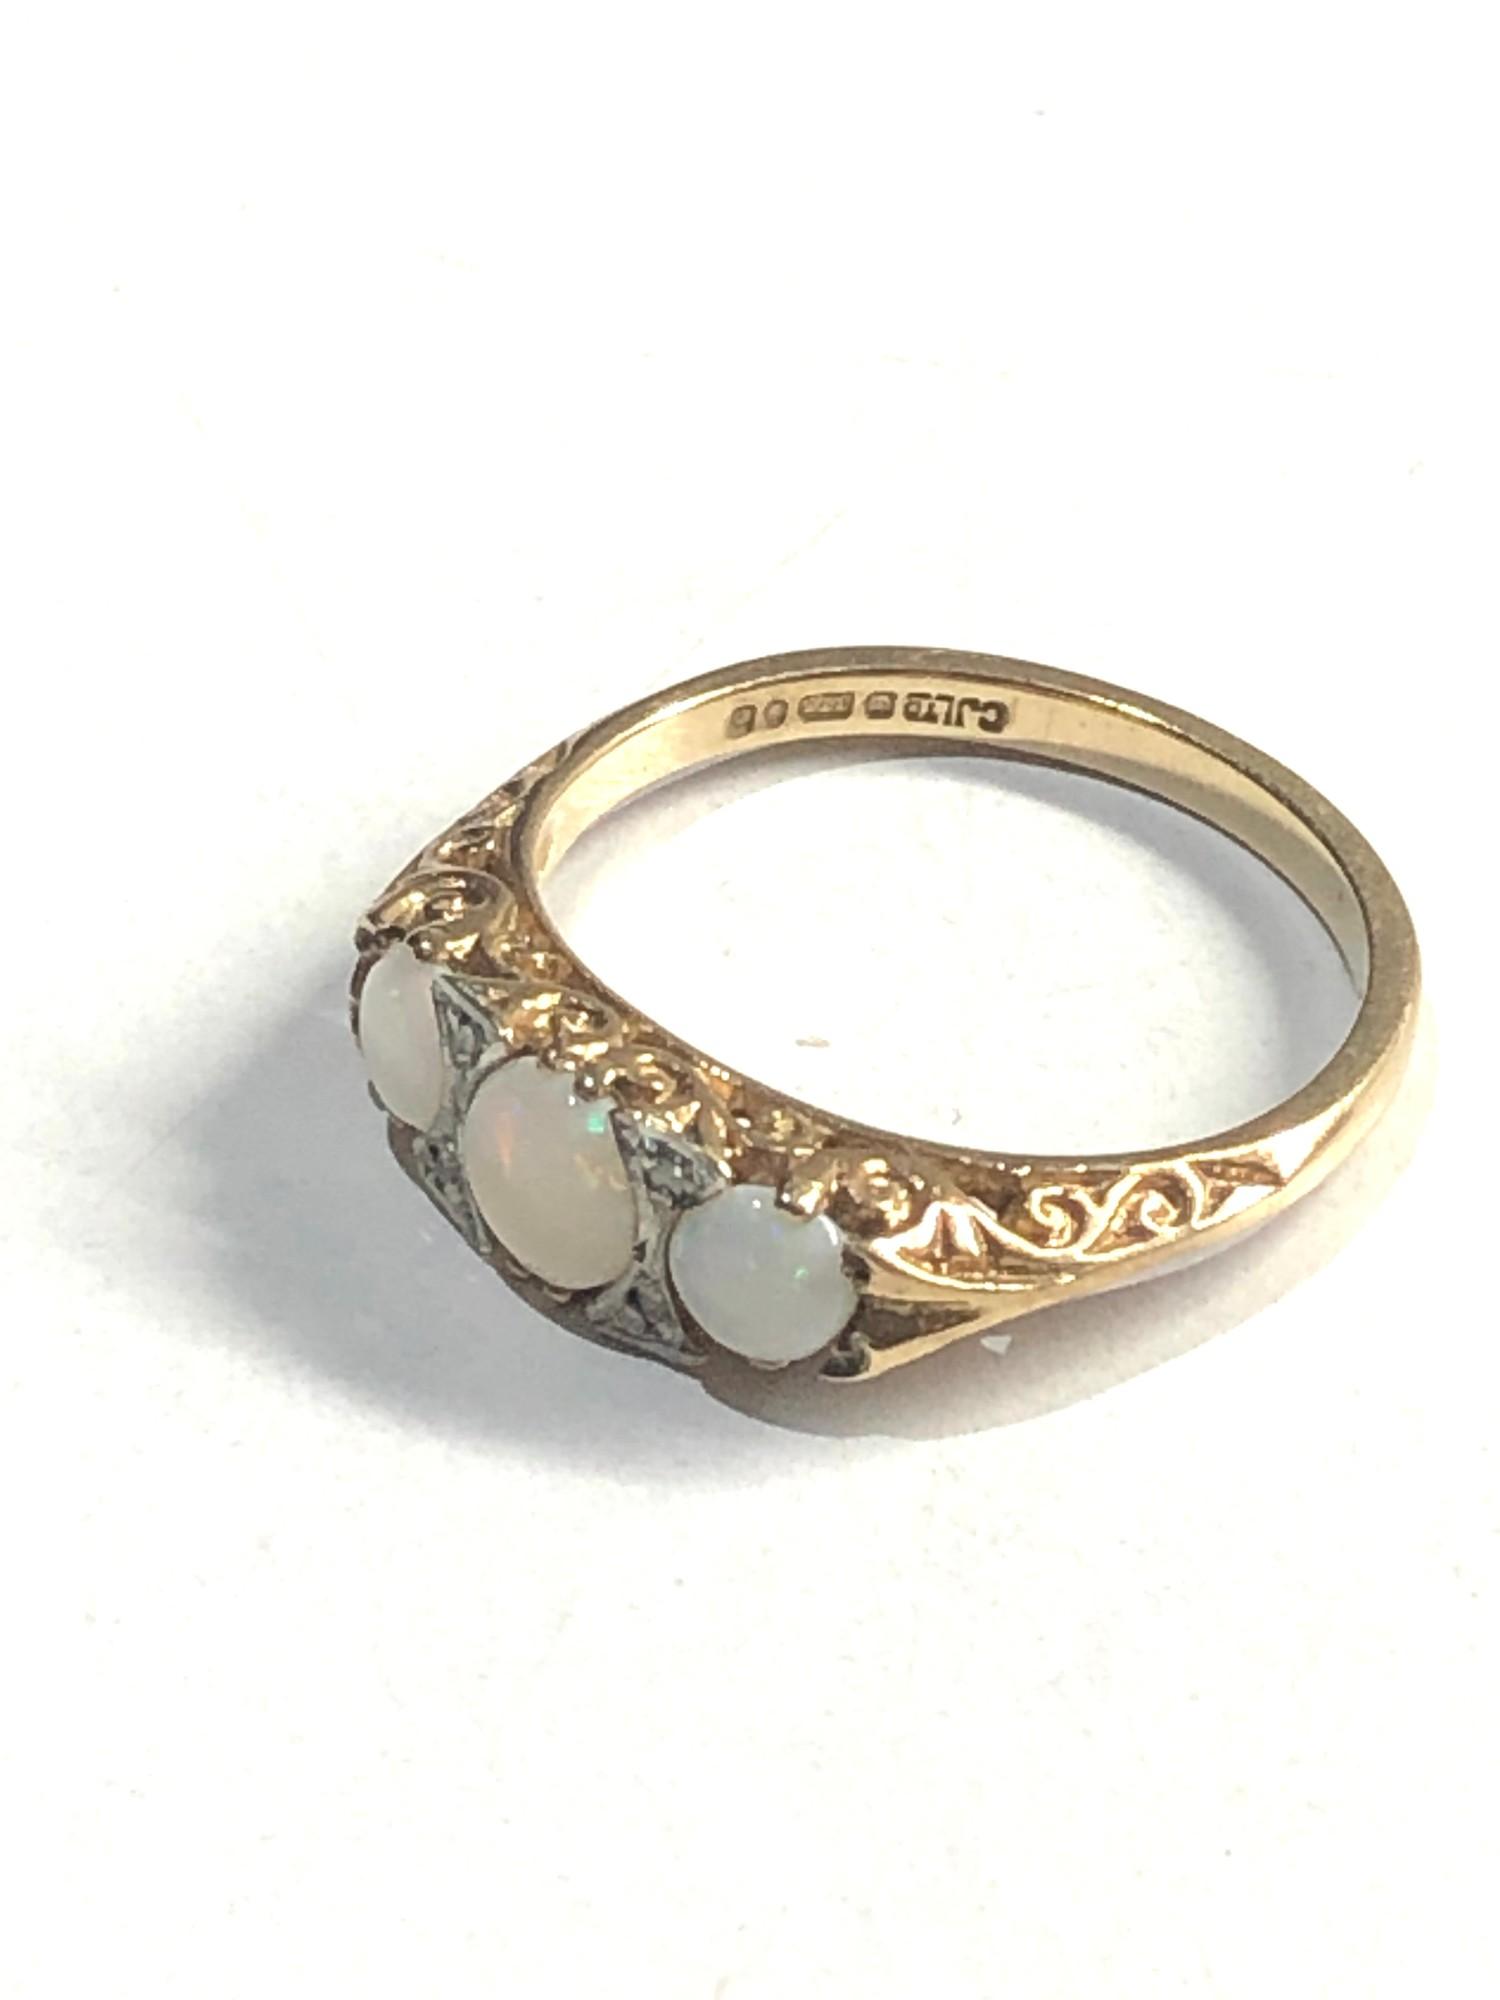 Vintage 9ct Gold opal & diamond detail ring 2.6G - Image 2 of 3